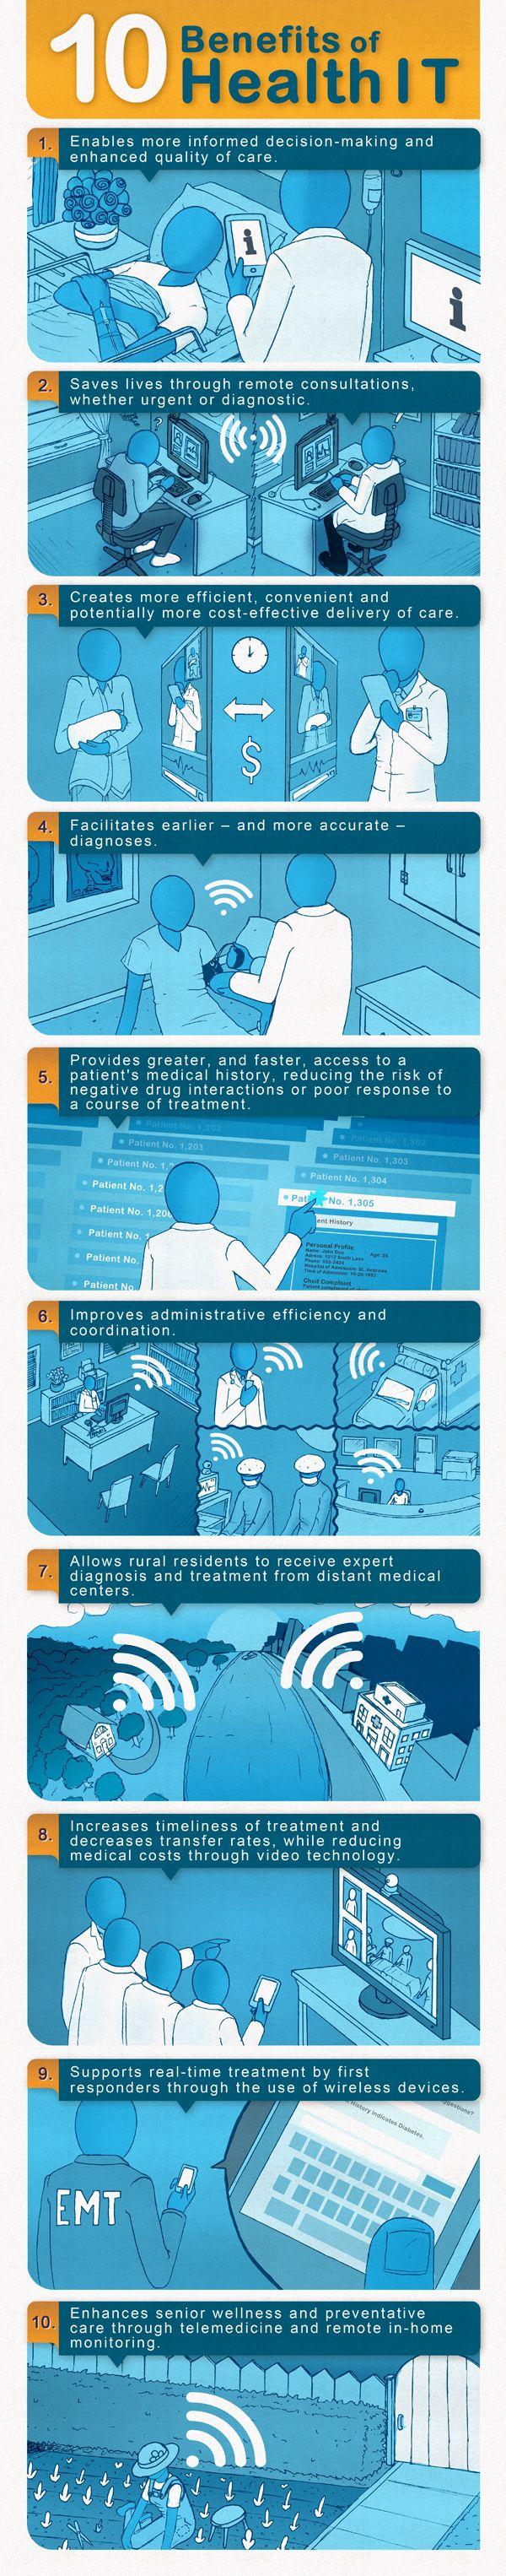 Well summarized: 10 Benefits of #HealthIT Infographic #healthcare #innovation #entrepreneur